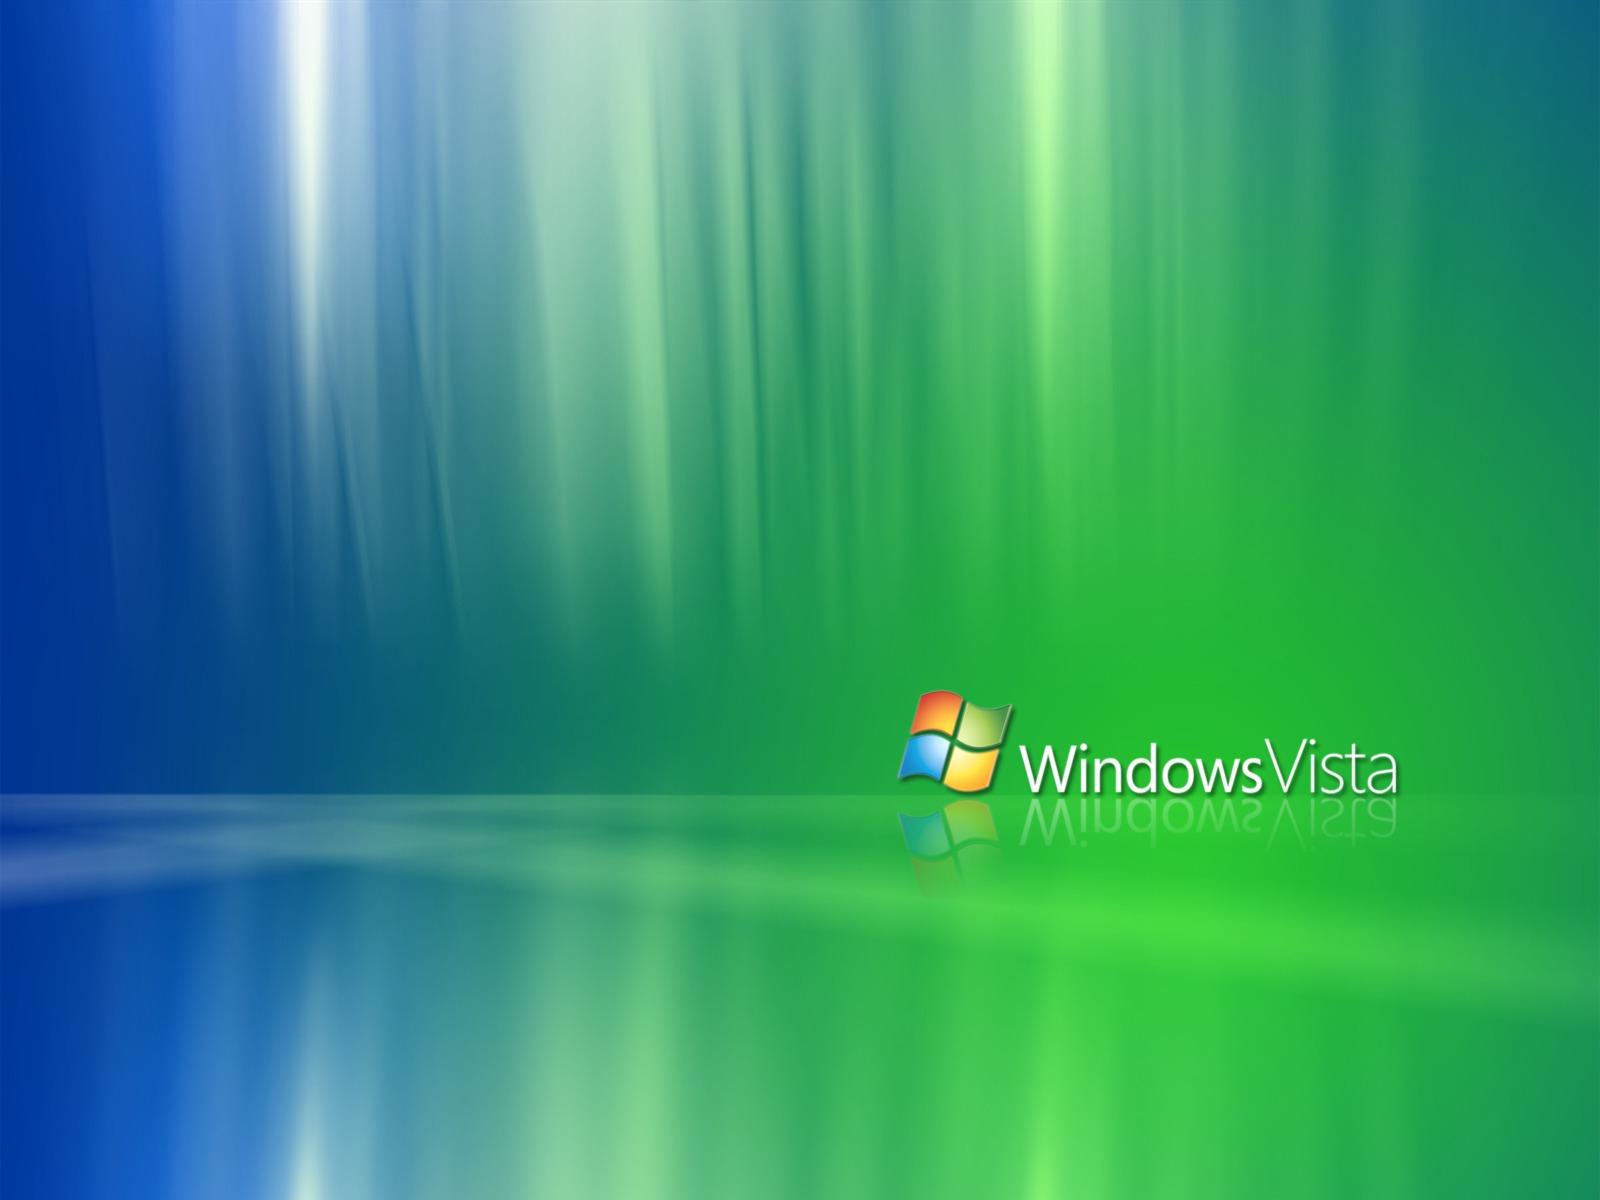 windows vista wallpaper windows vista computers wallpapers in jpg